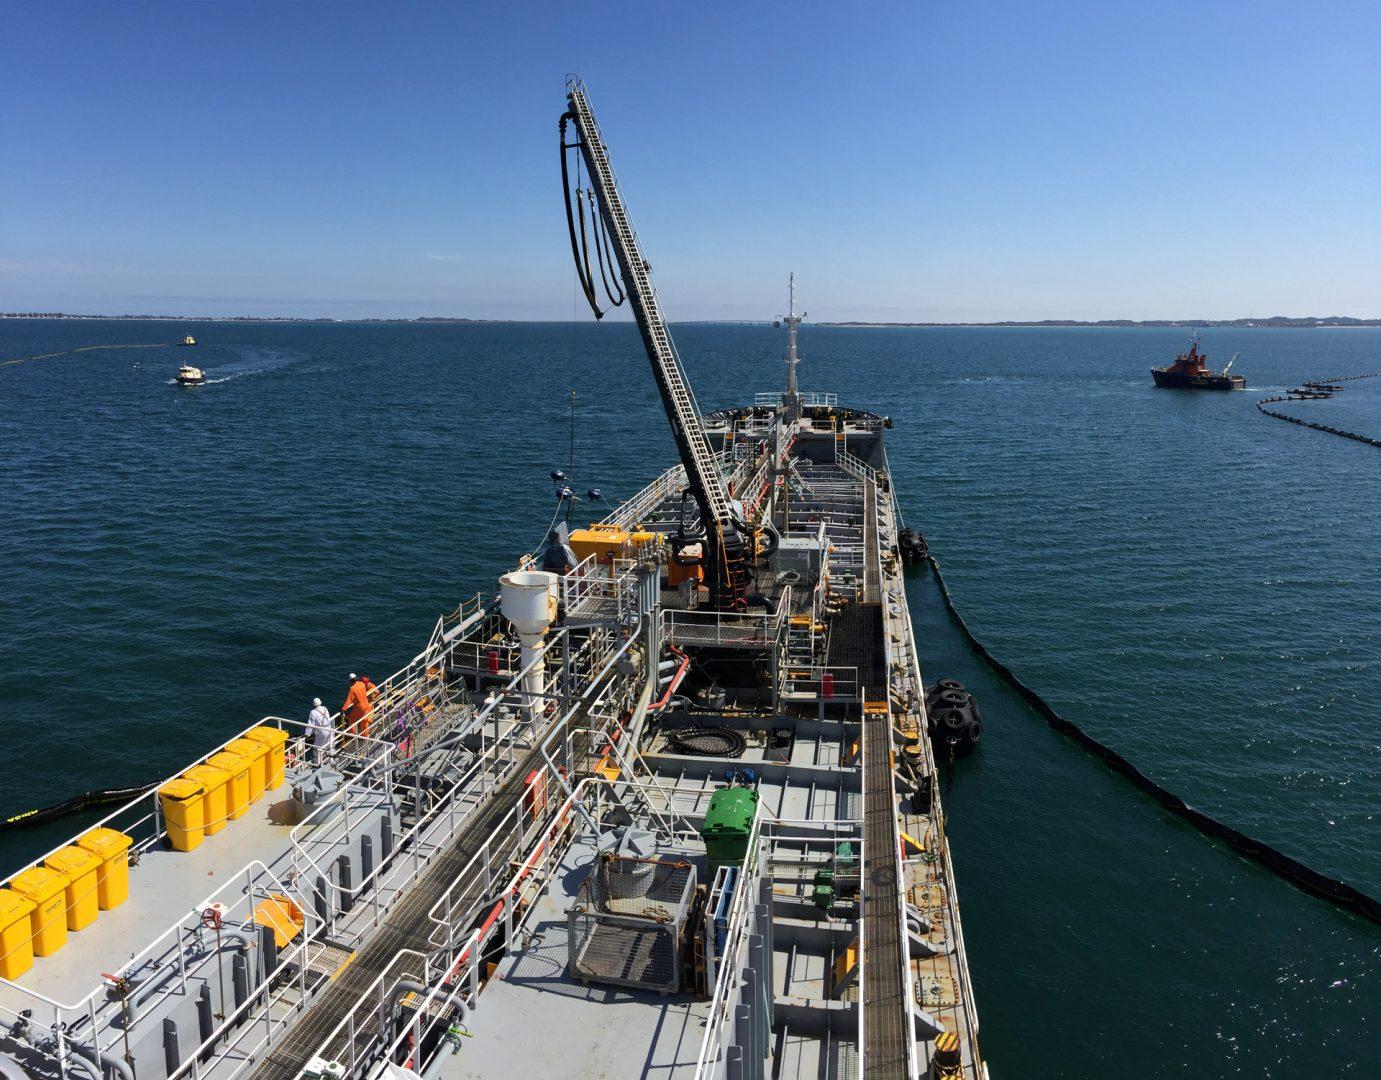 Blackstump Tests Oil Containment Concept | Svitzer Australia